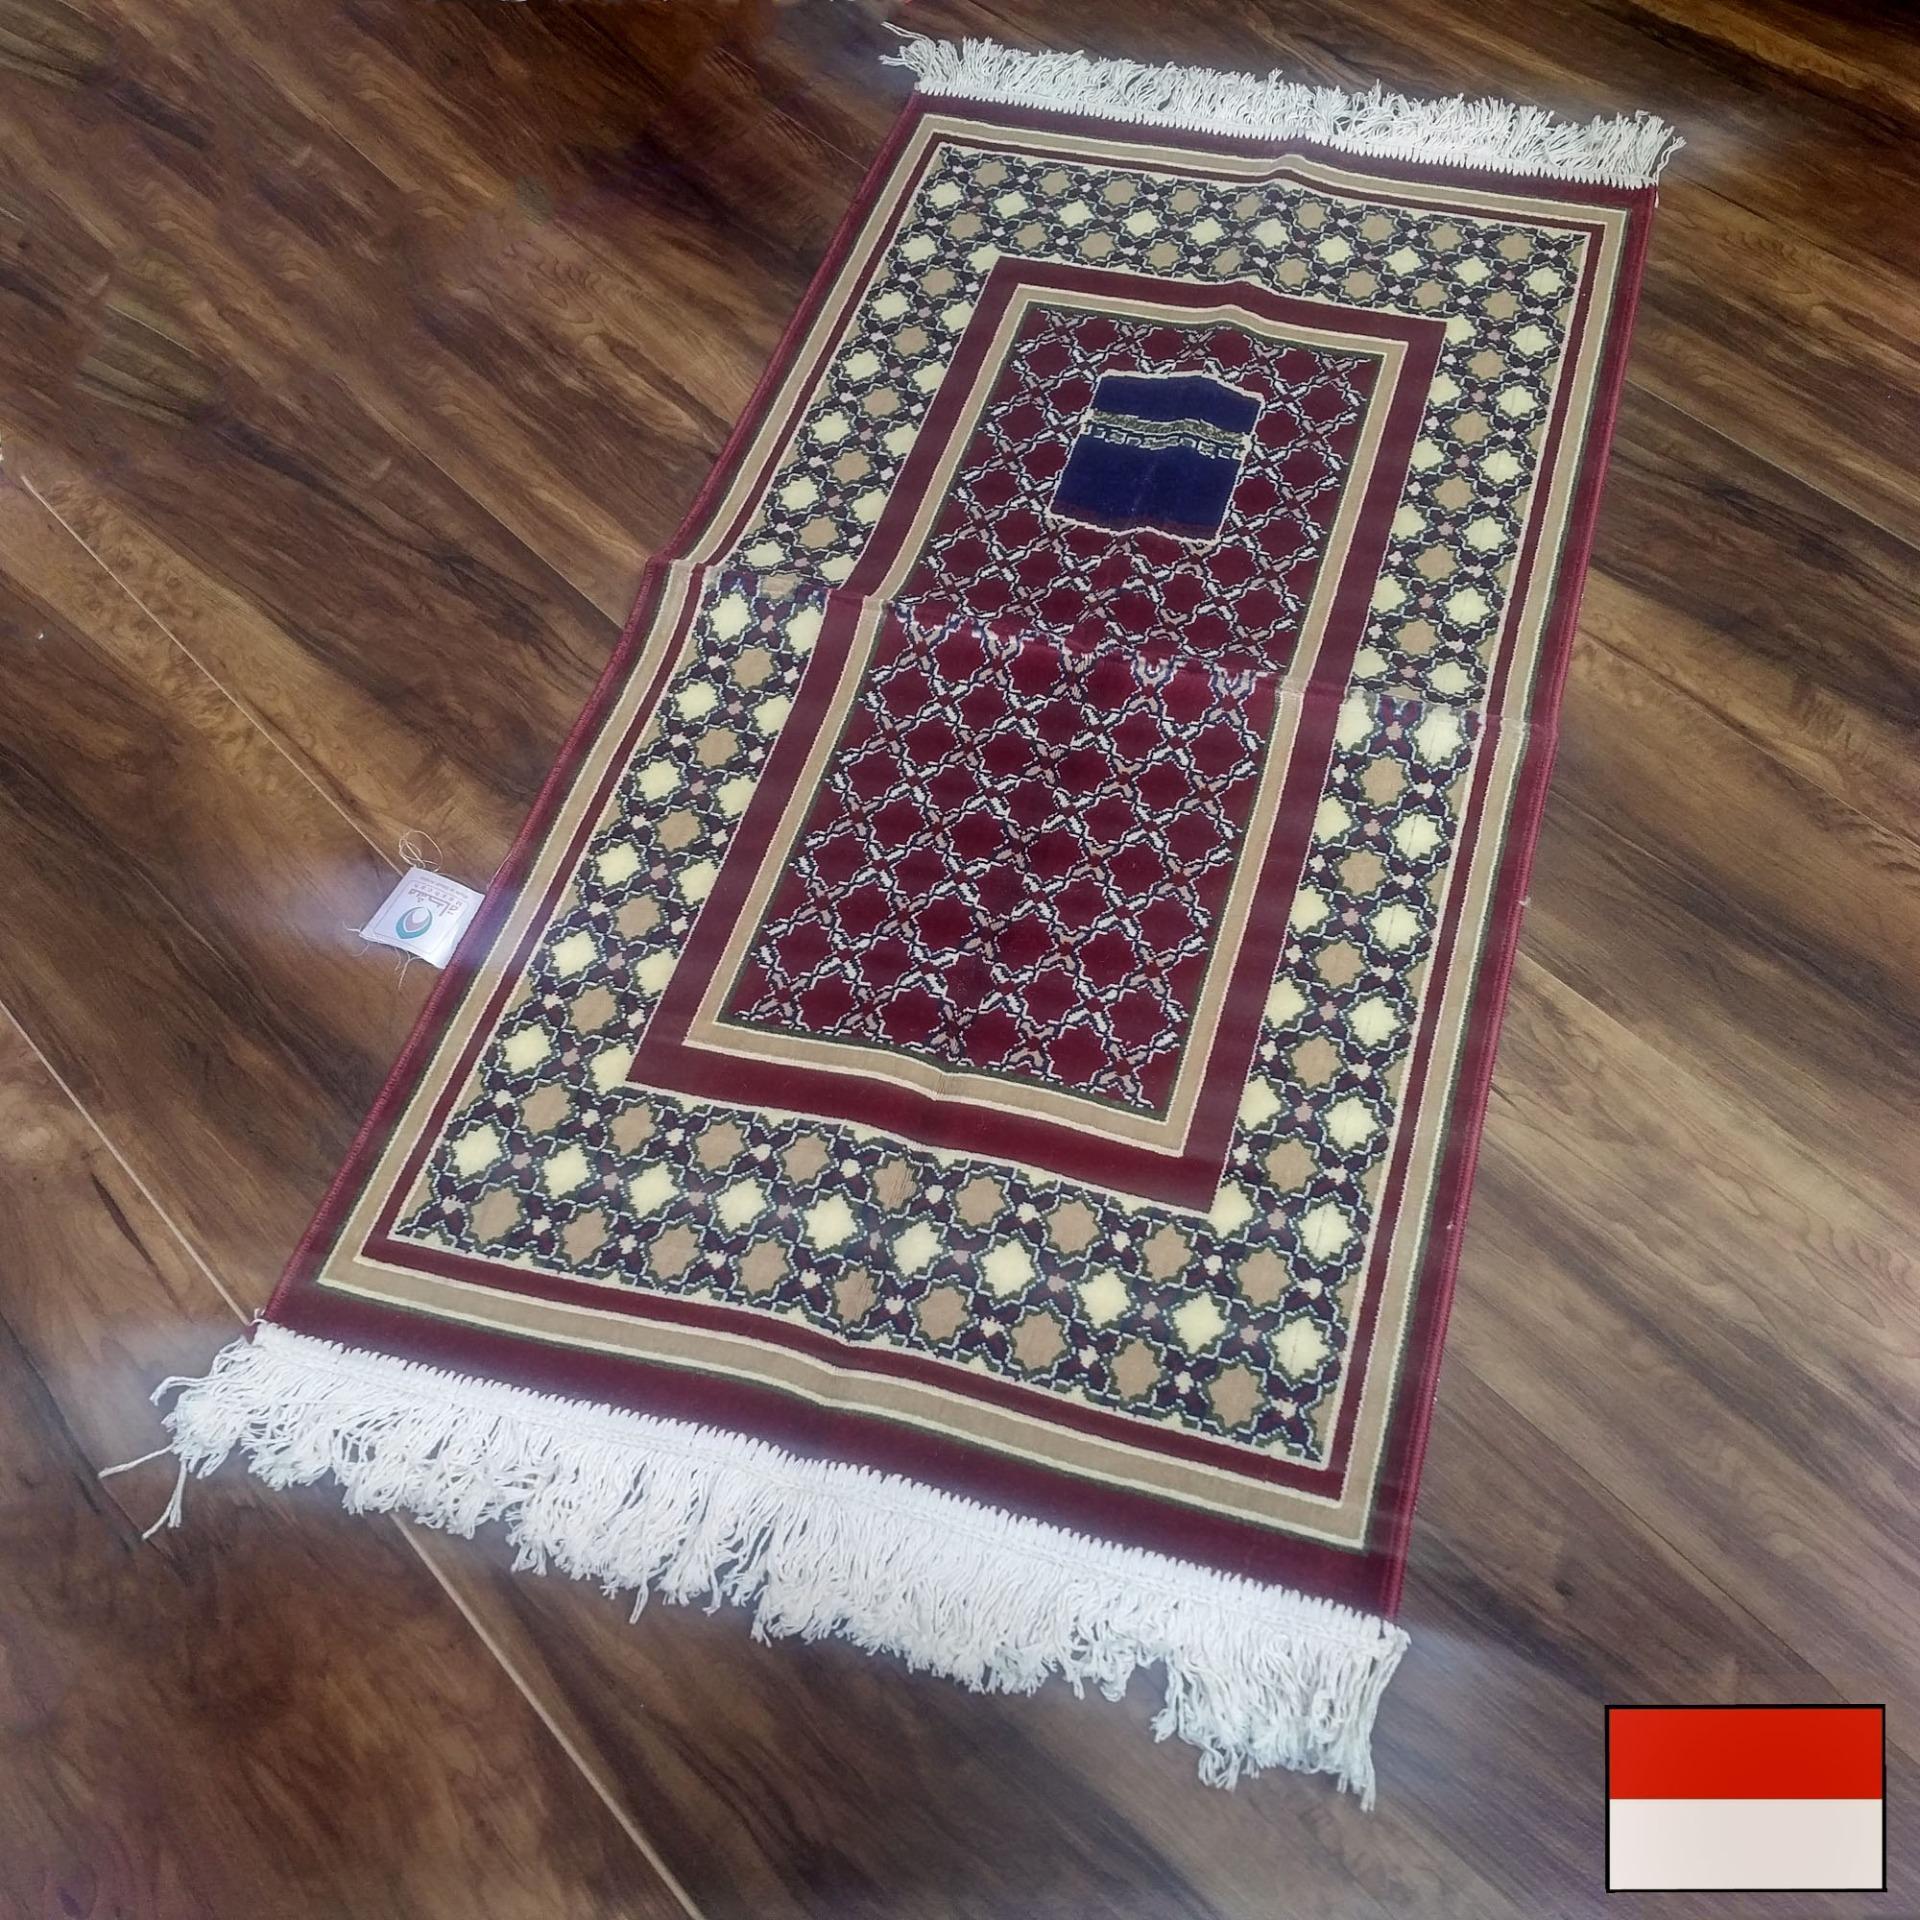 Sajadah Roll Medeena 105 X 570 Cm 21003 Pilar Merah Daftar Harga Source · Mada Sajadah Saudi Arabia Midi Soft Polypropylene 52 cm x 103 cm Merah